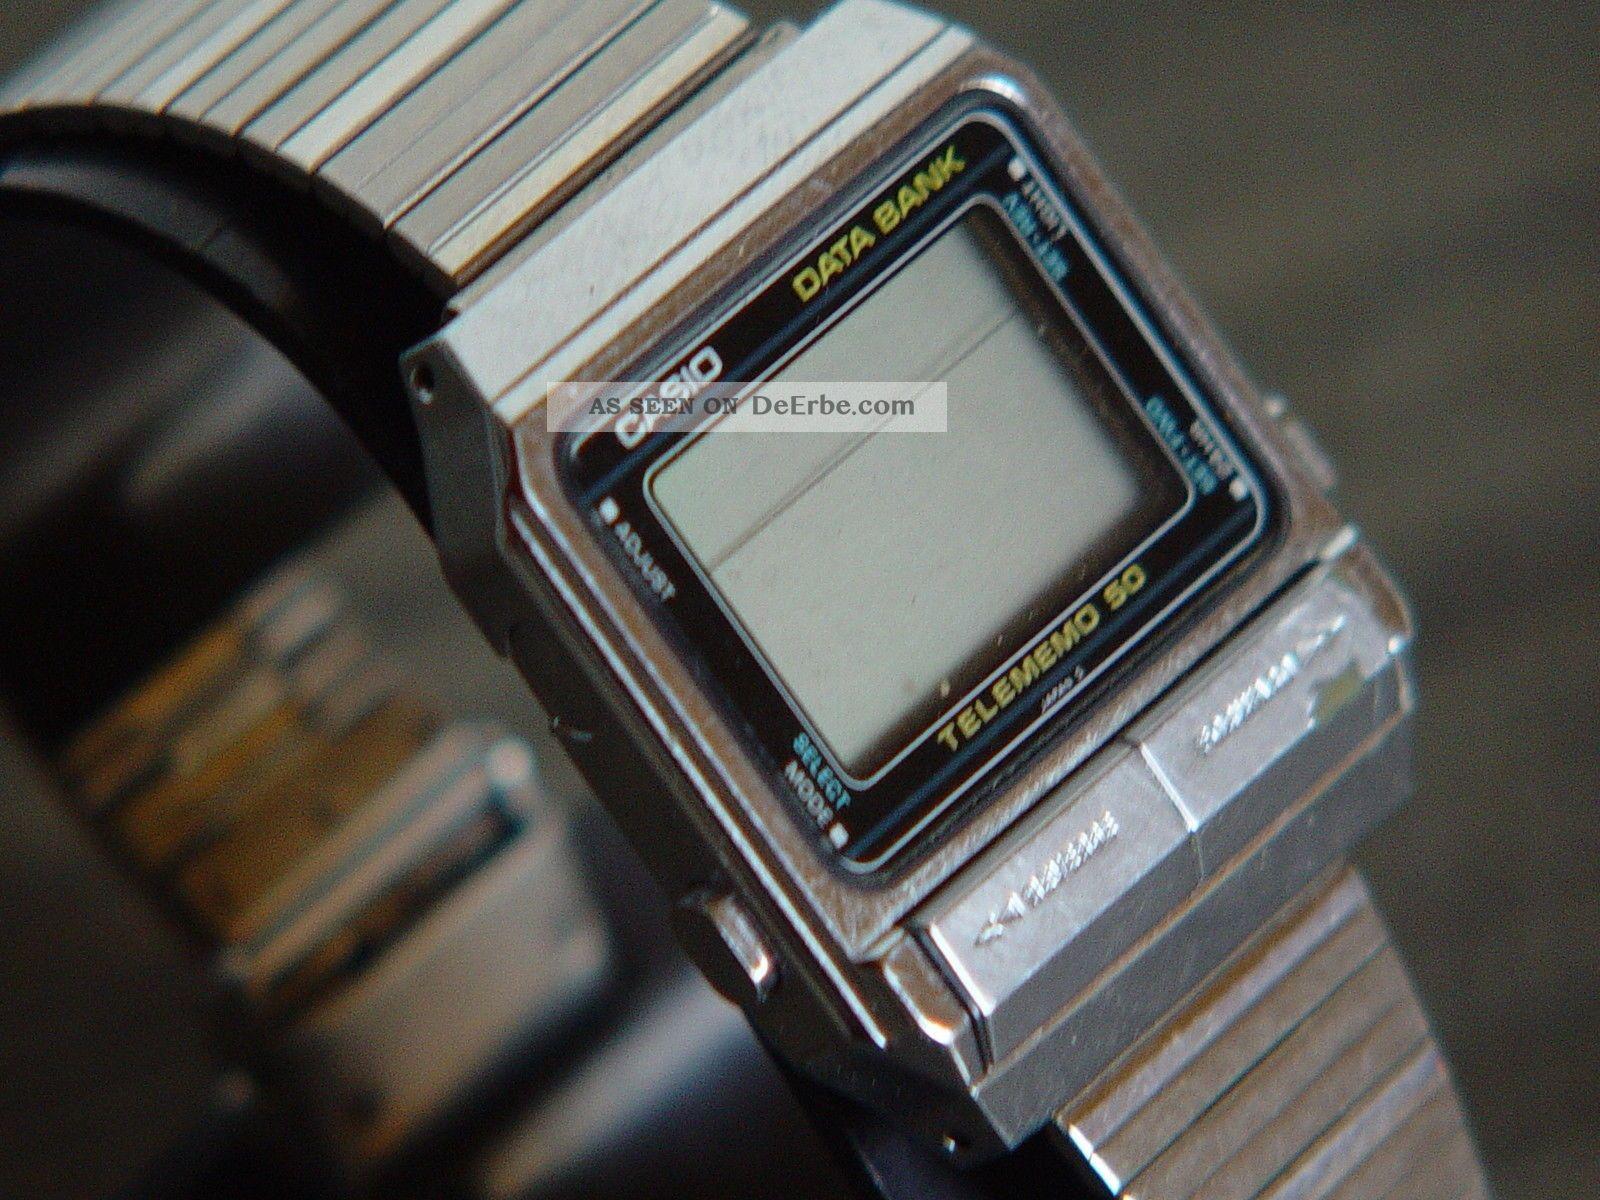 Casio - Db - 500 Databank - Armbanduhr Telememo 50 Qw.  262 Japan AÑo.  1984 Ungeprüft 1970-1979 Bild